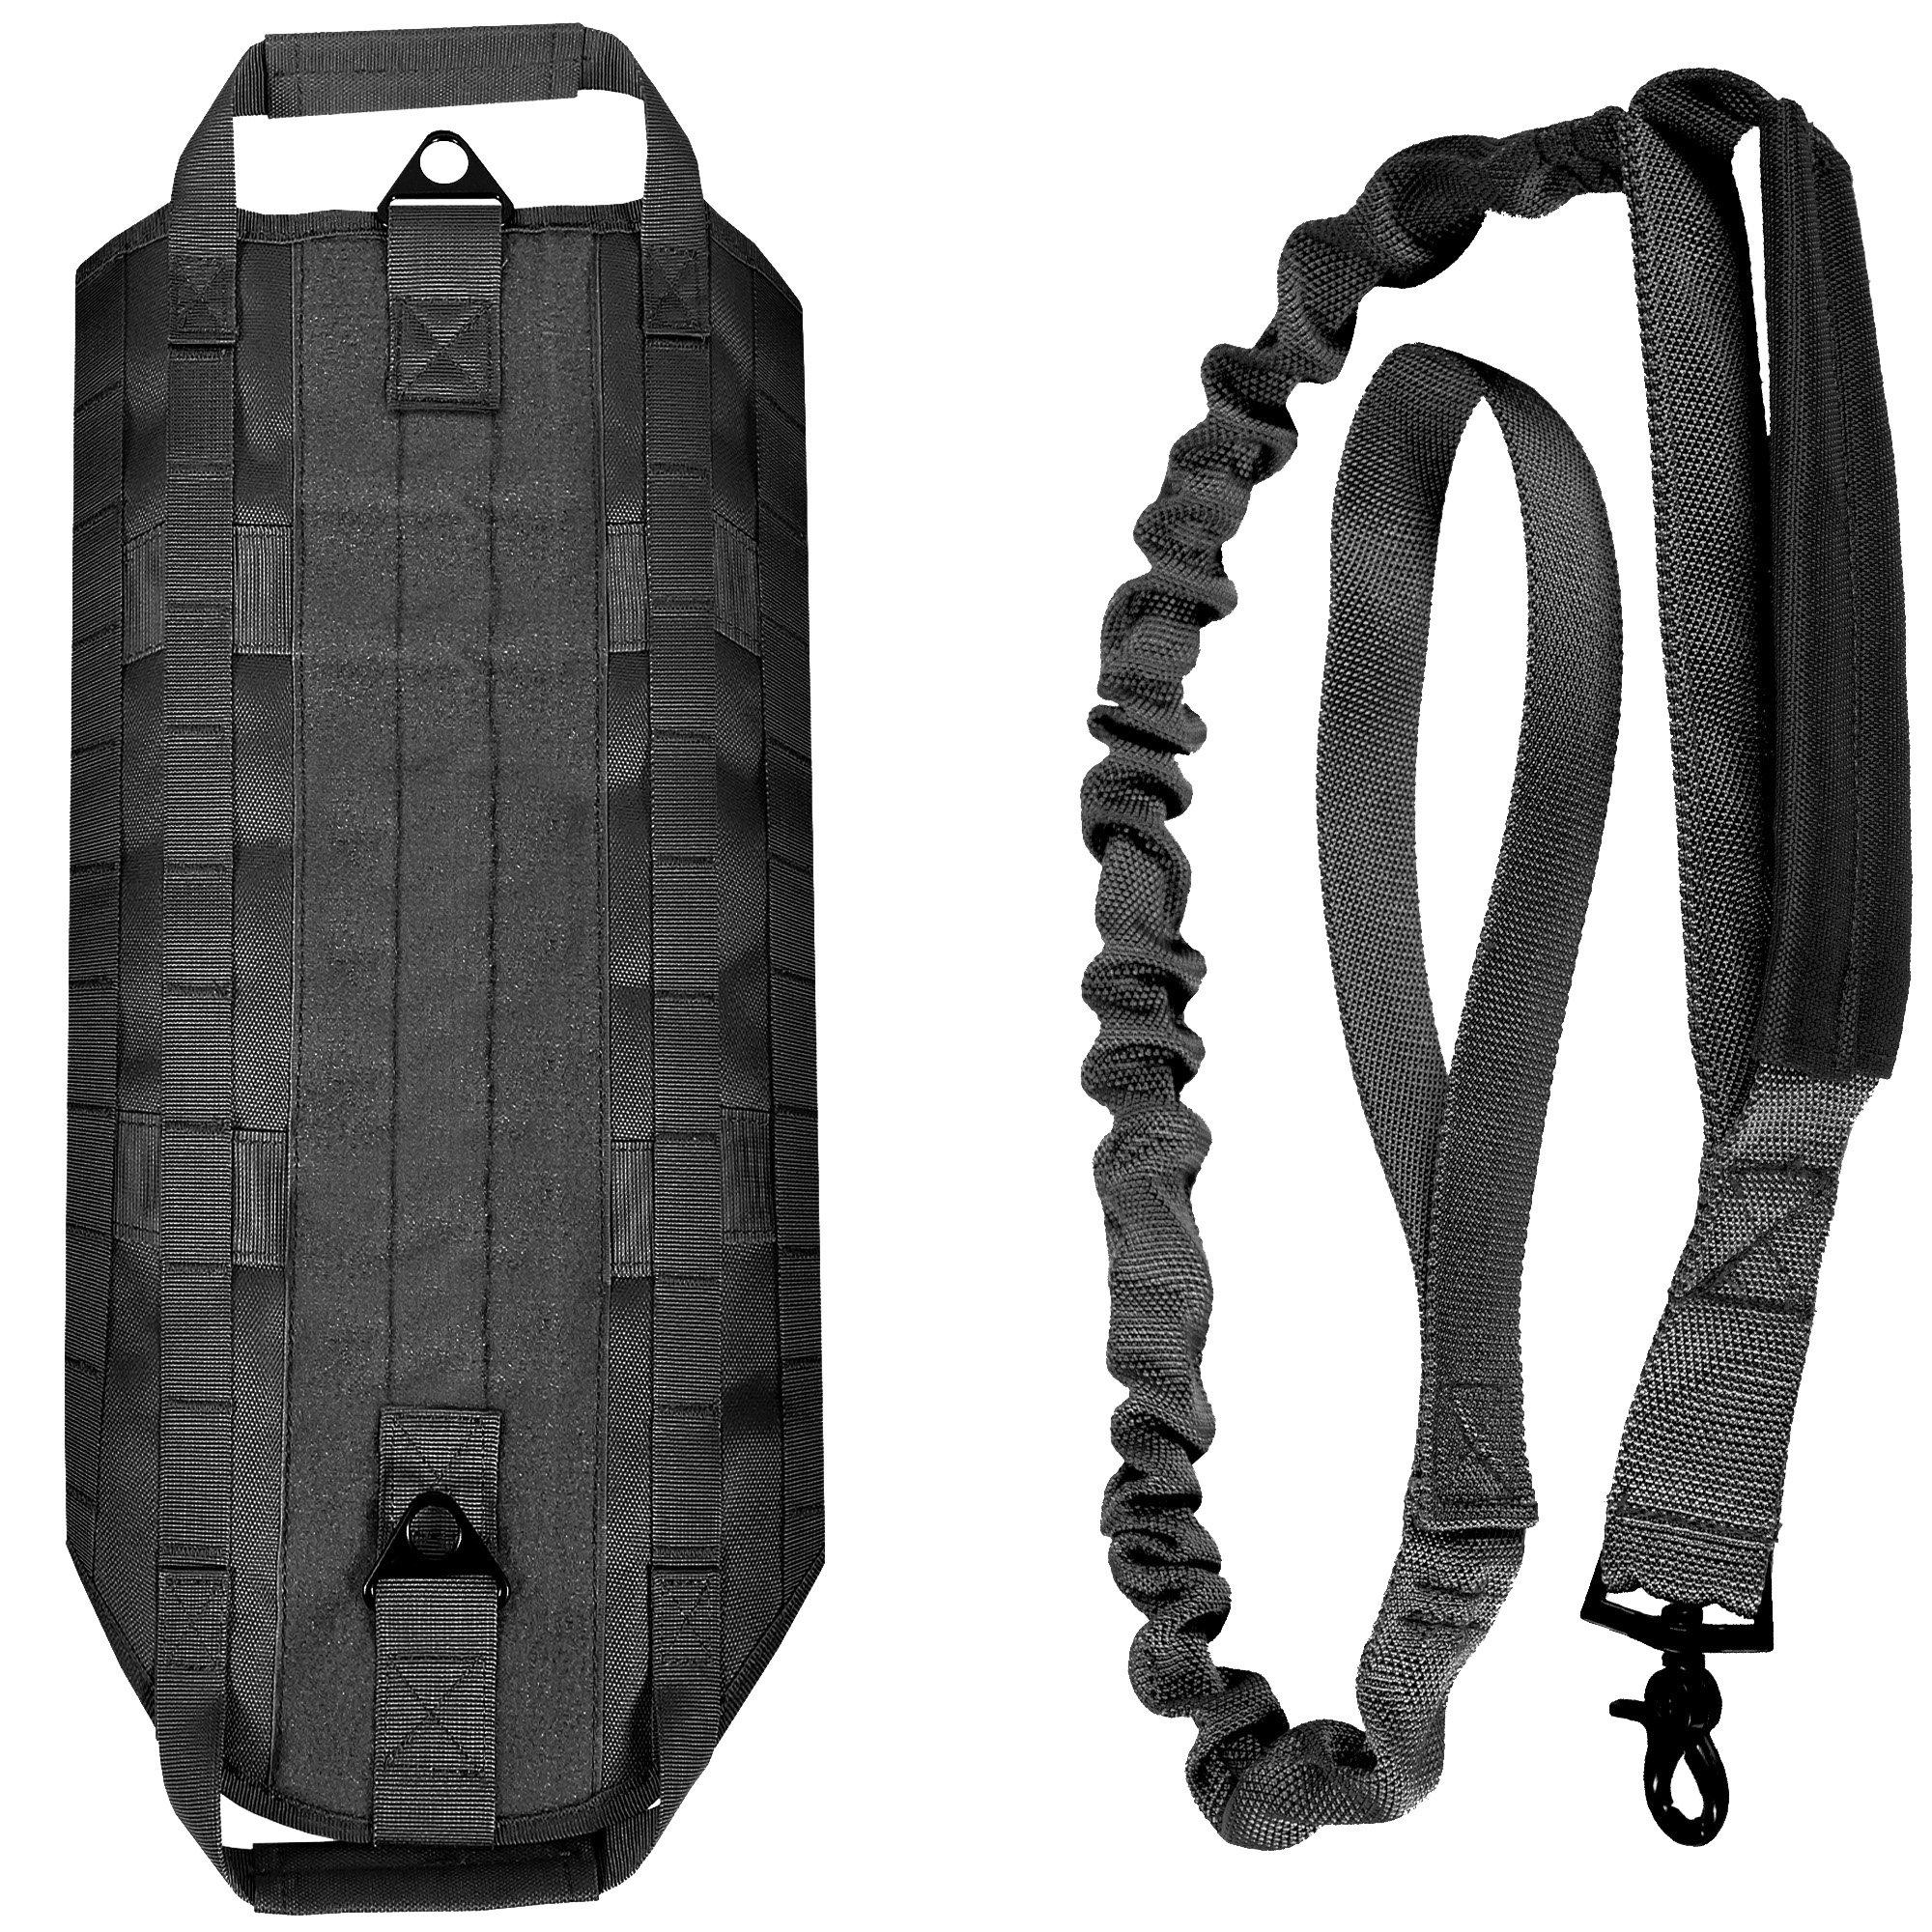 LIVABIT [ Black Canine Service Dog Tactical Molle Vest Harness + Matching Heavy Duty Bungee Leash Strap Medium by LIVABIT